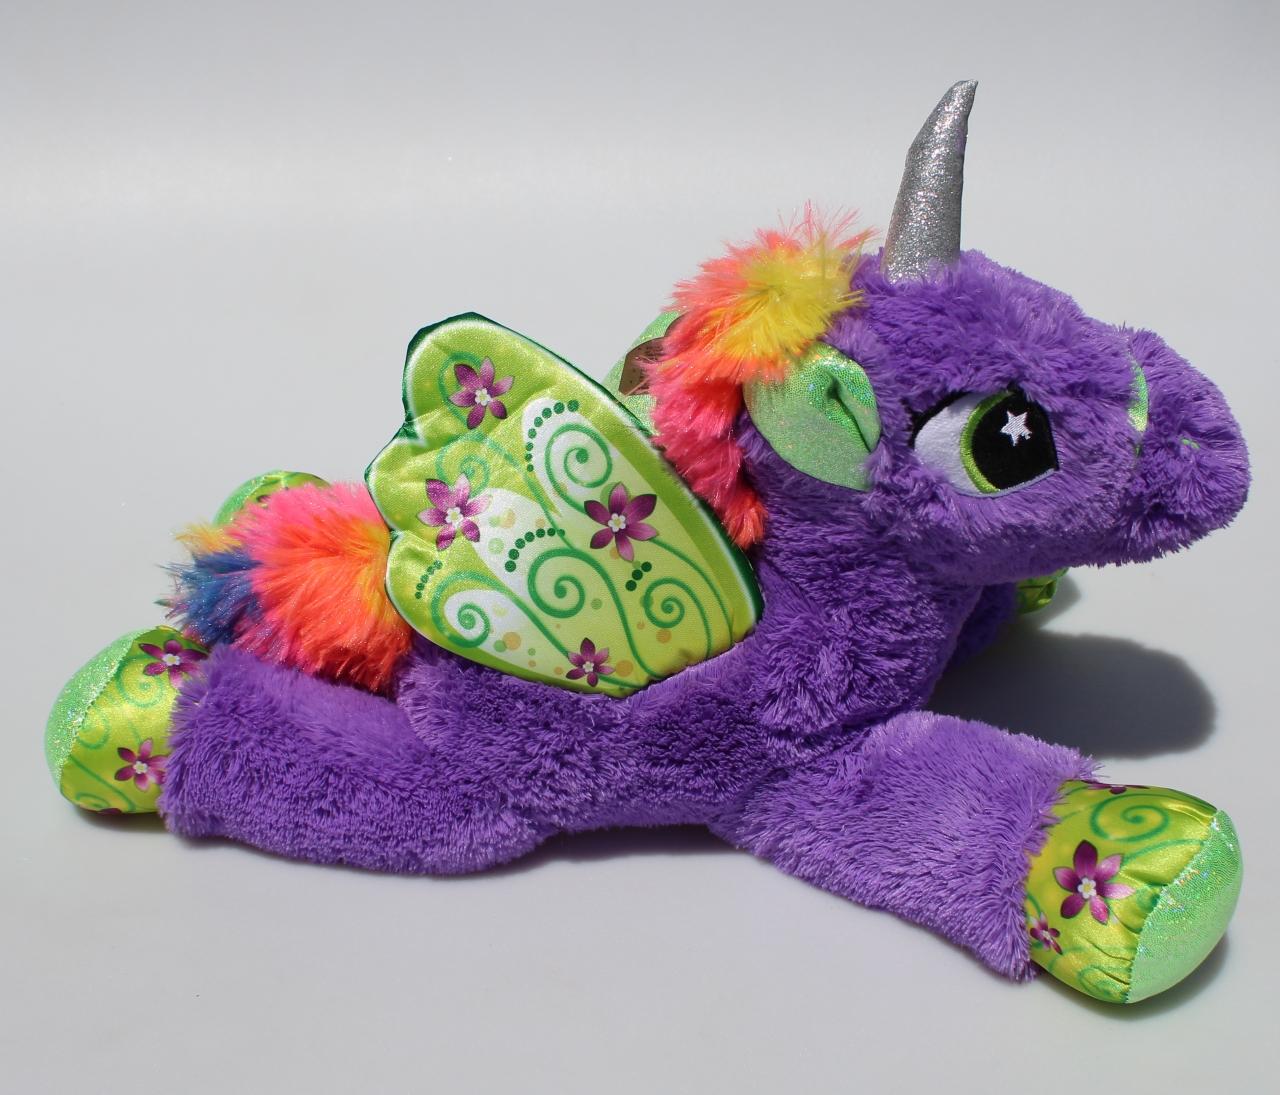 db61cc49267c loyal plush - Dinotoys Pegasus